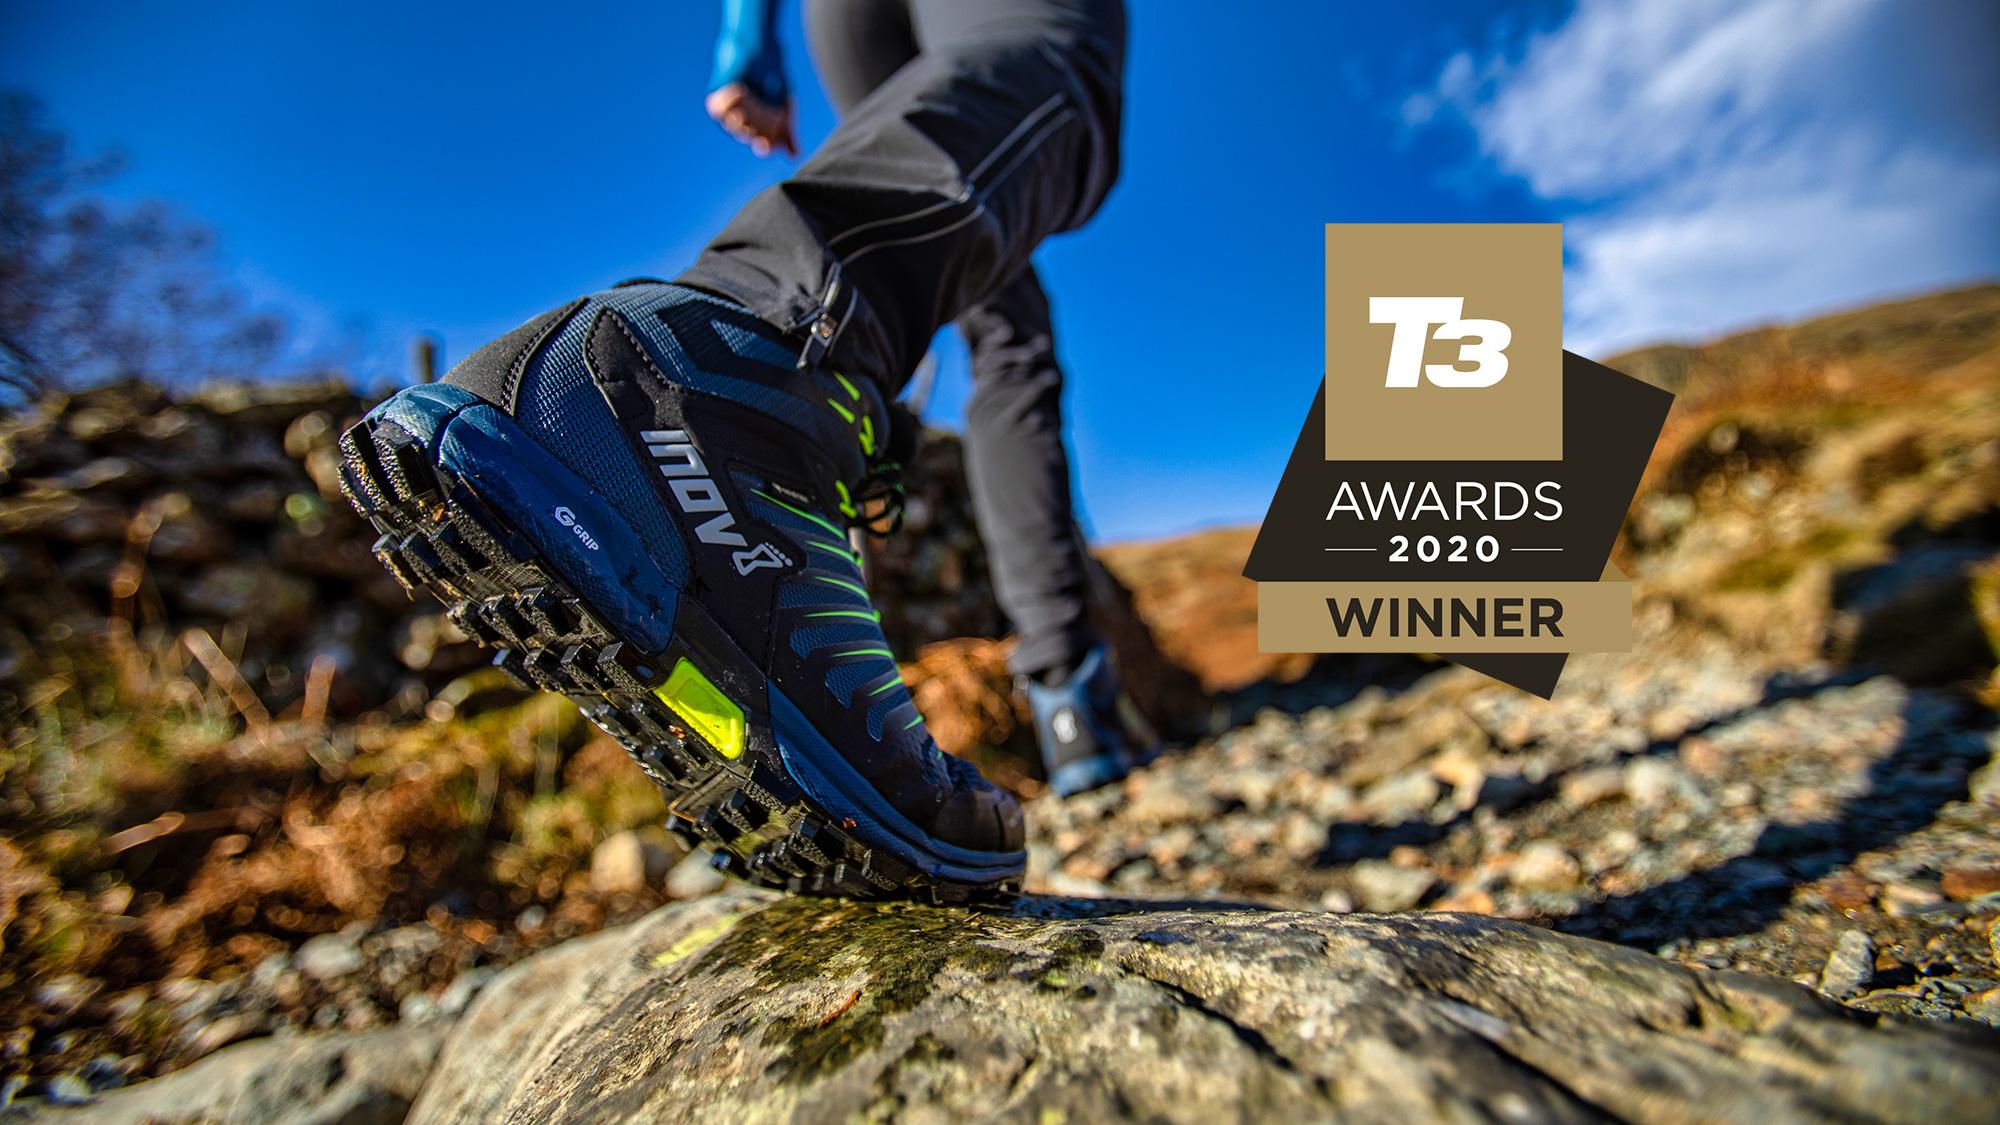 T3 Awards 2020: Inov-8's Roclite G 345